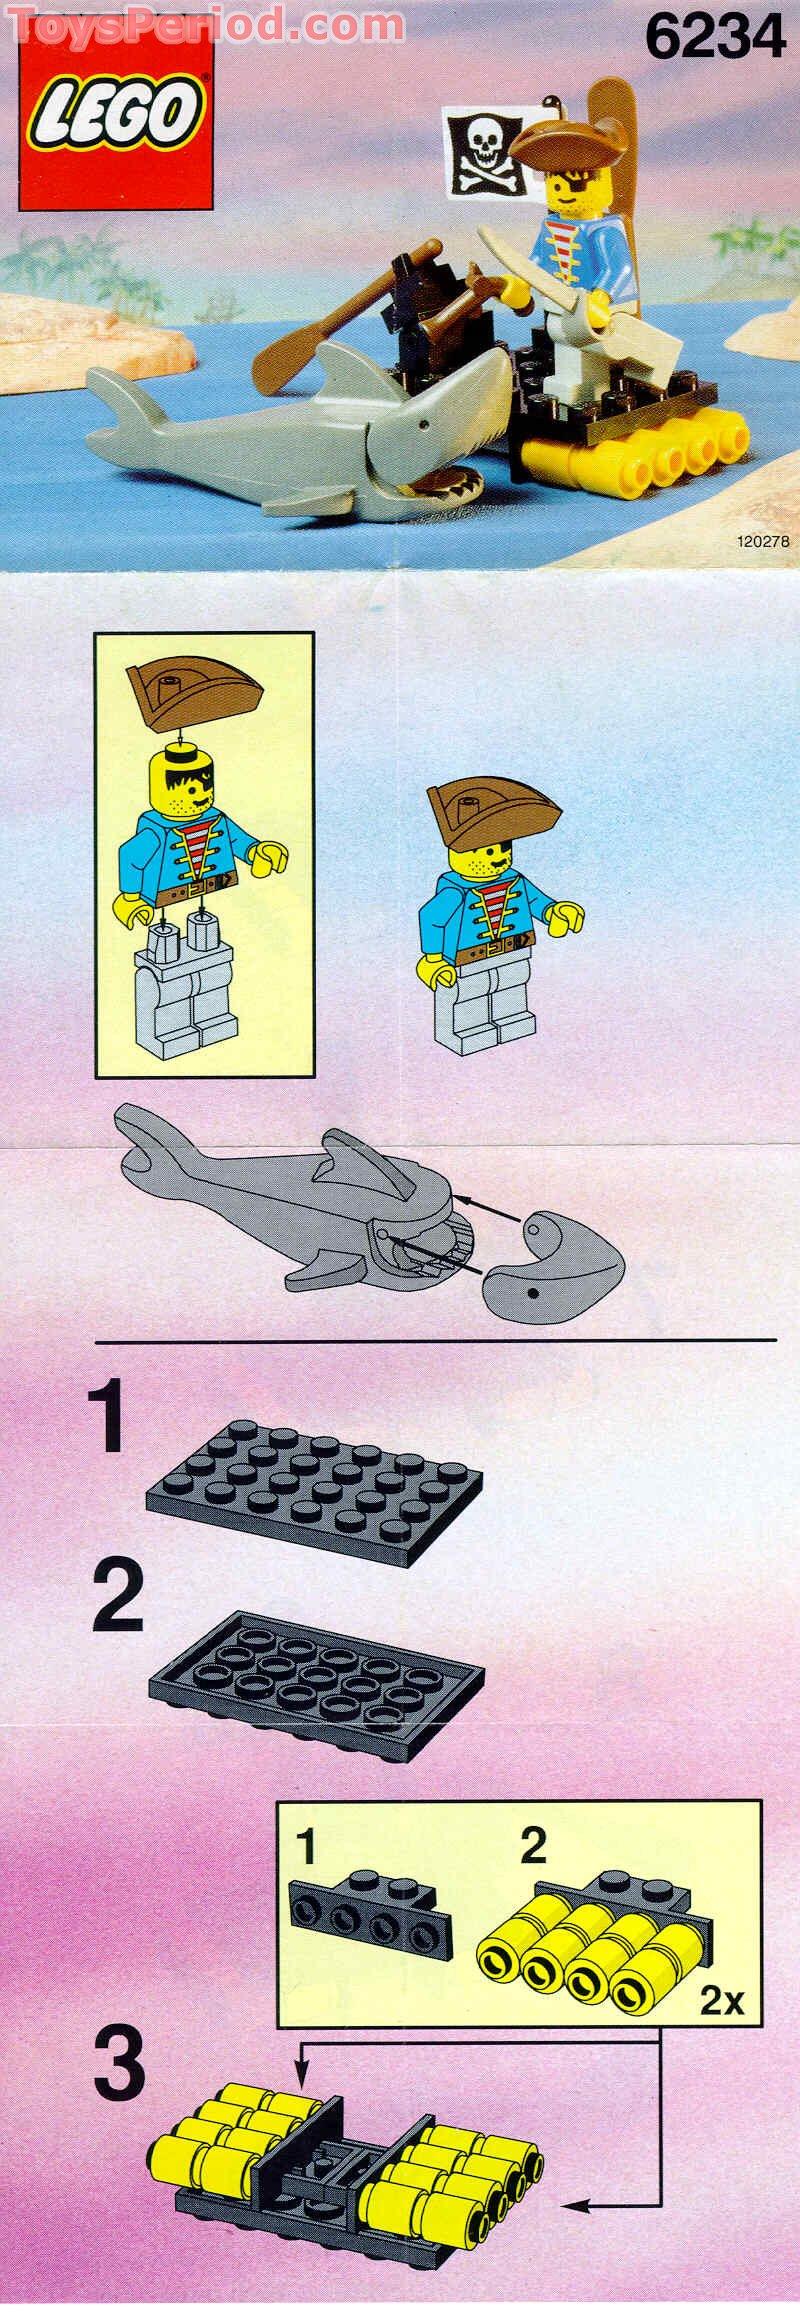 lego gun instructions pdf